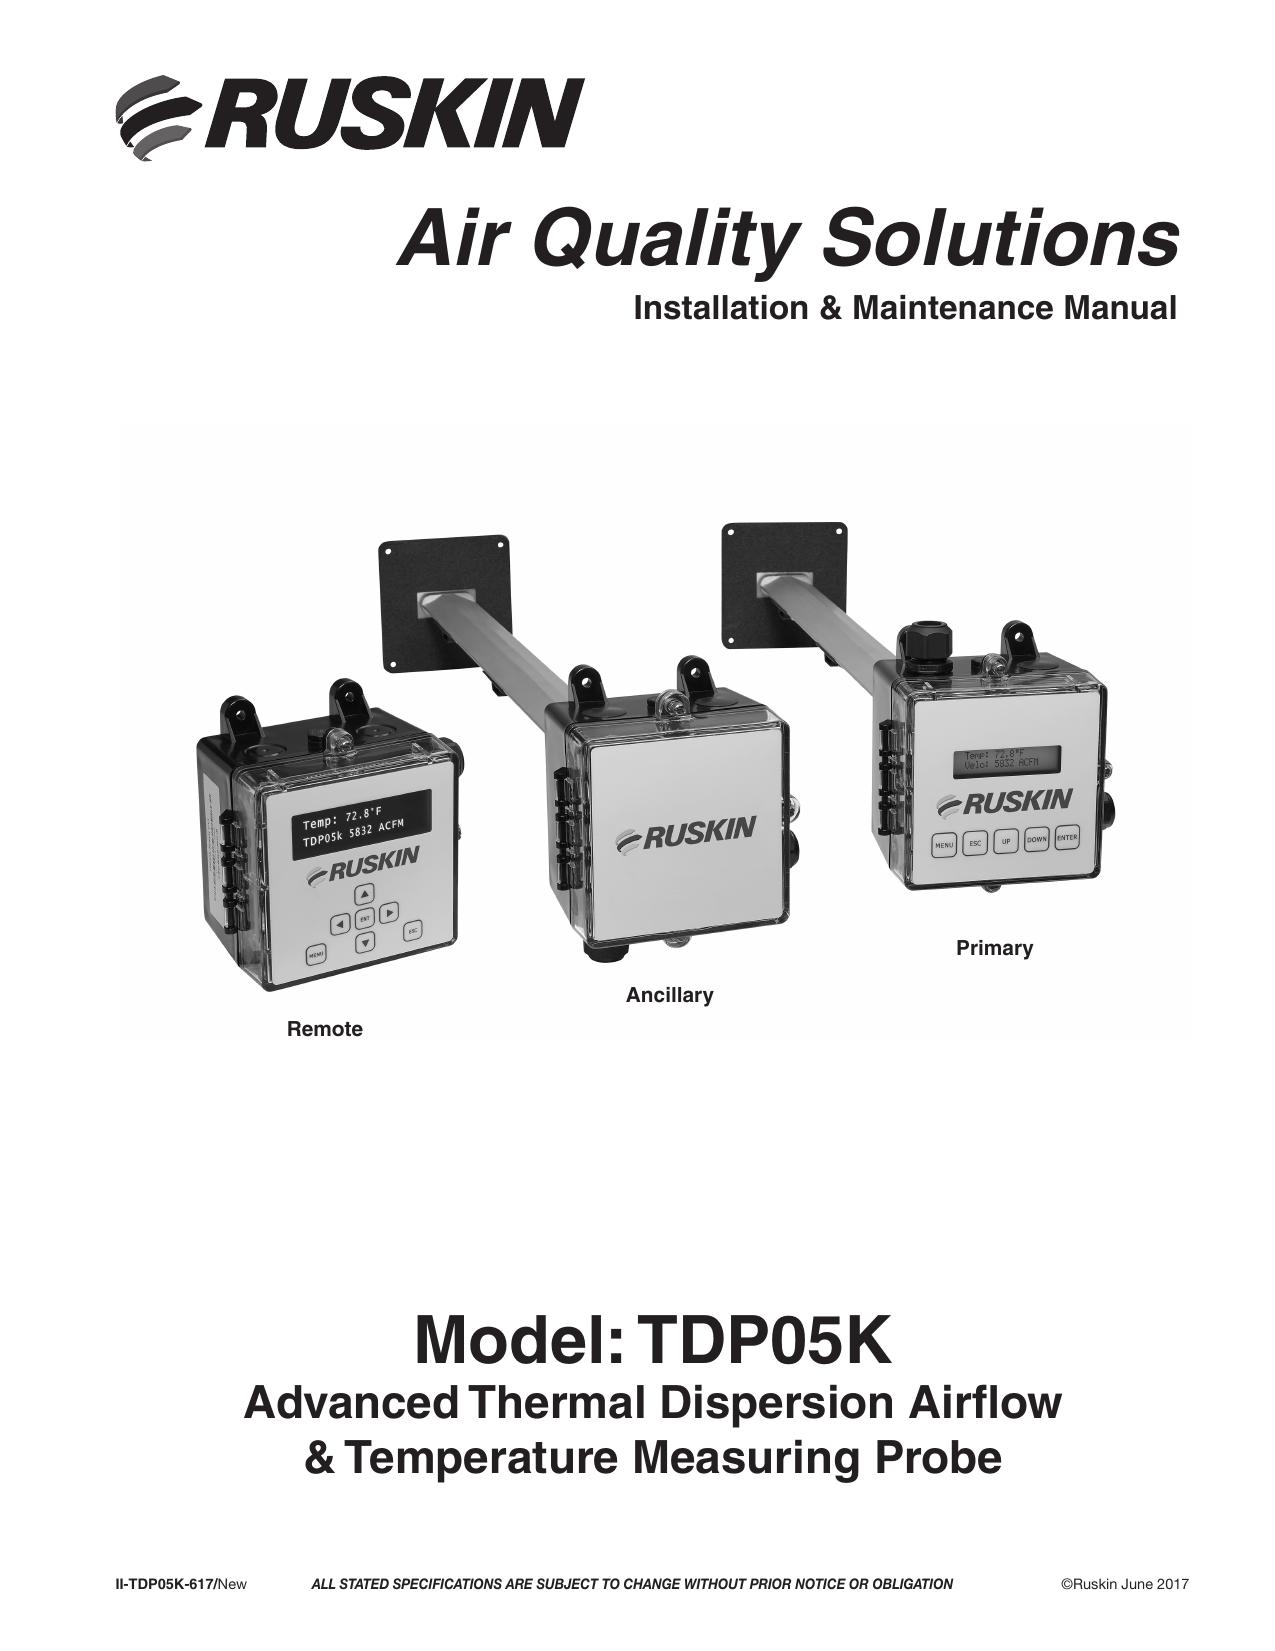 II-TDP05K-617/New 24pgs indd | manualzz com